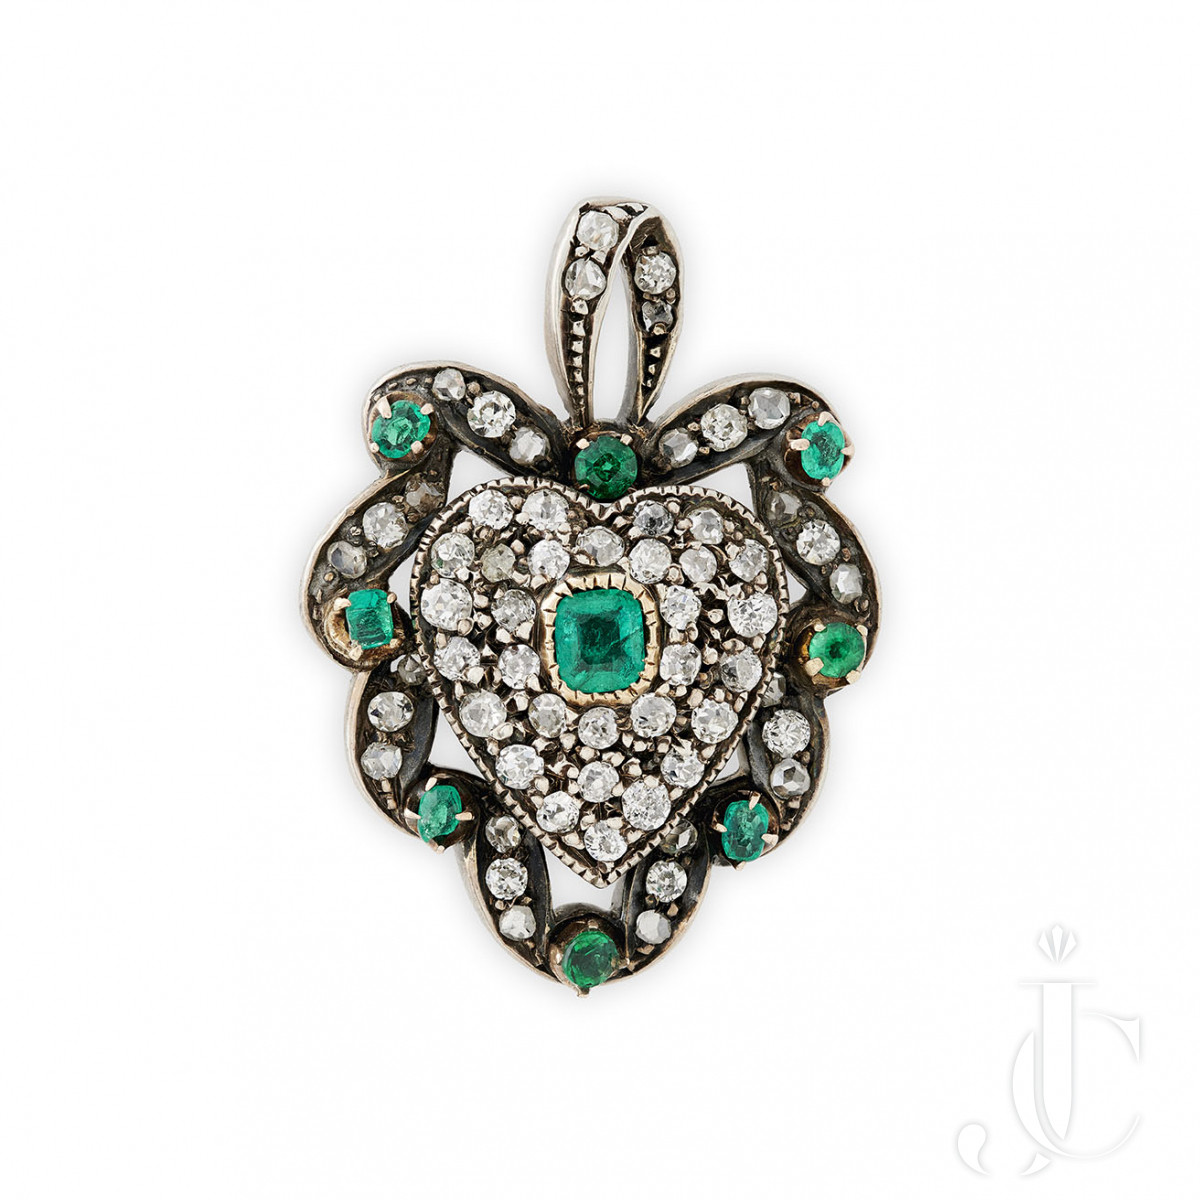 Victorian emerald and diamond heart brooch/pendant